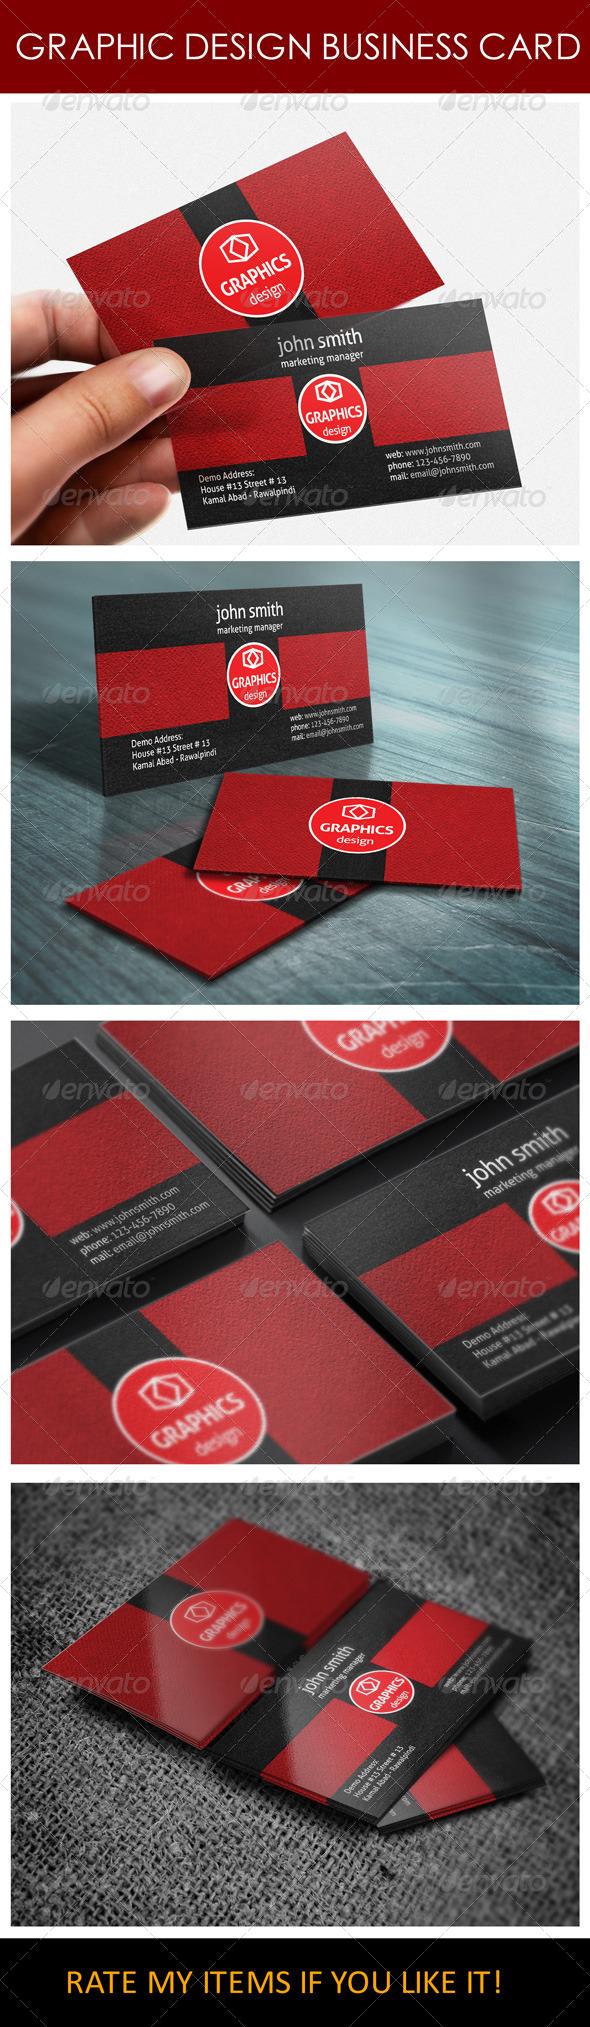 GraphicRiver Graphic Design Business Card 6241400